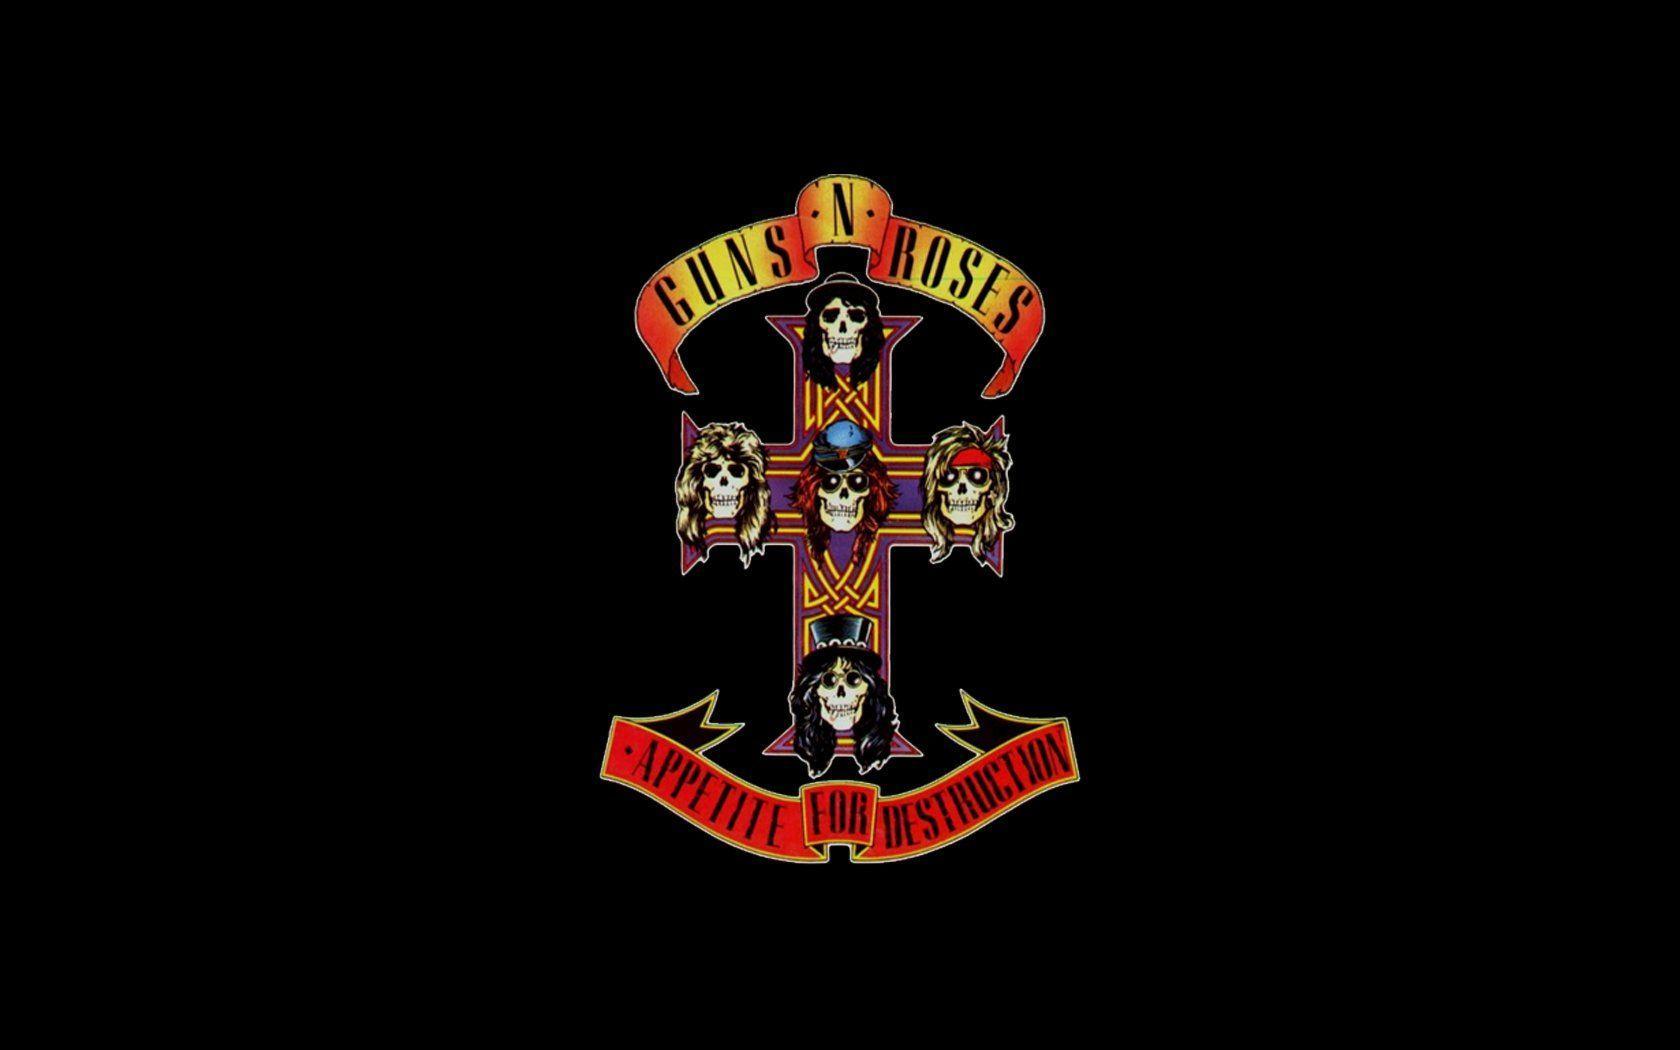 Guns N Roses Wallpapers Top Free Guns N Roses Backgrounds